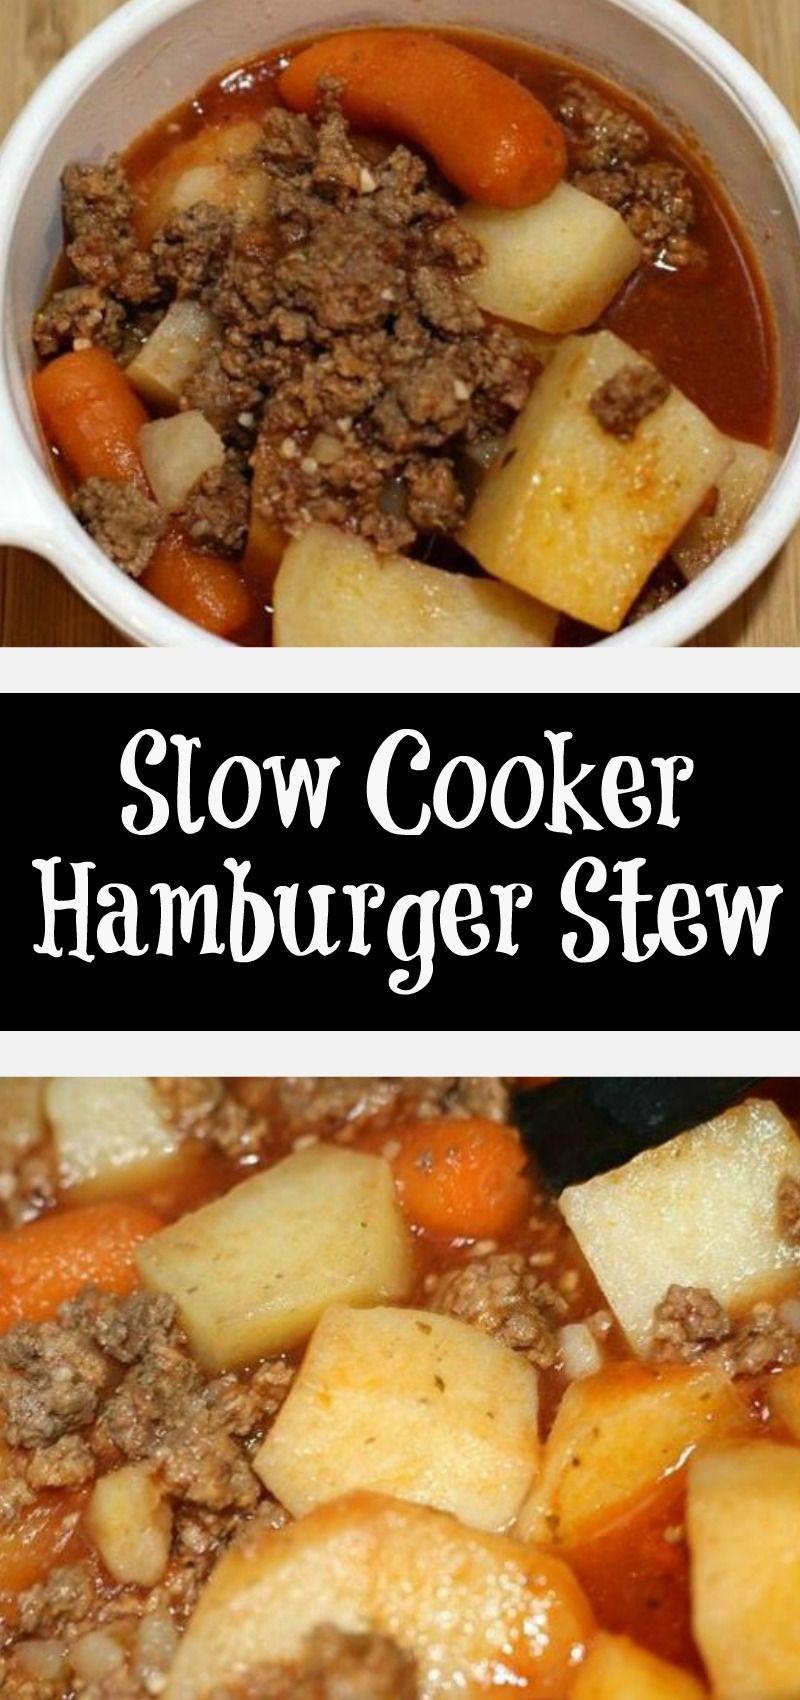 Slow Cooker Hamburger Stew Recipe